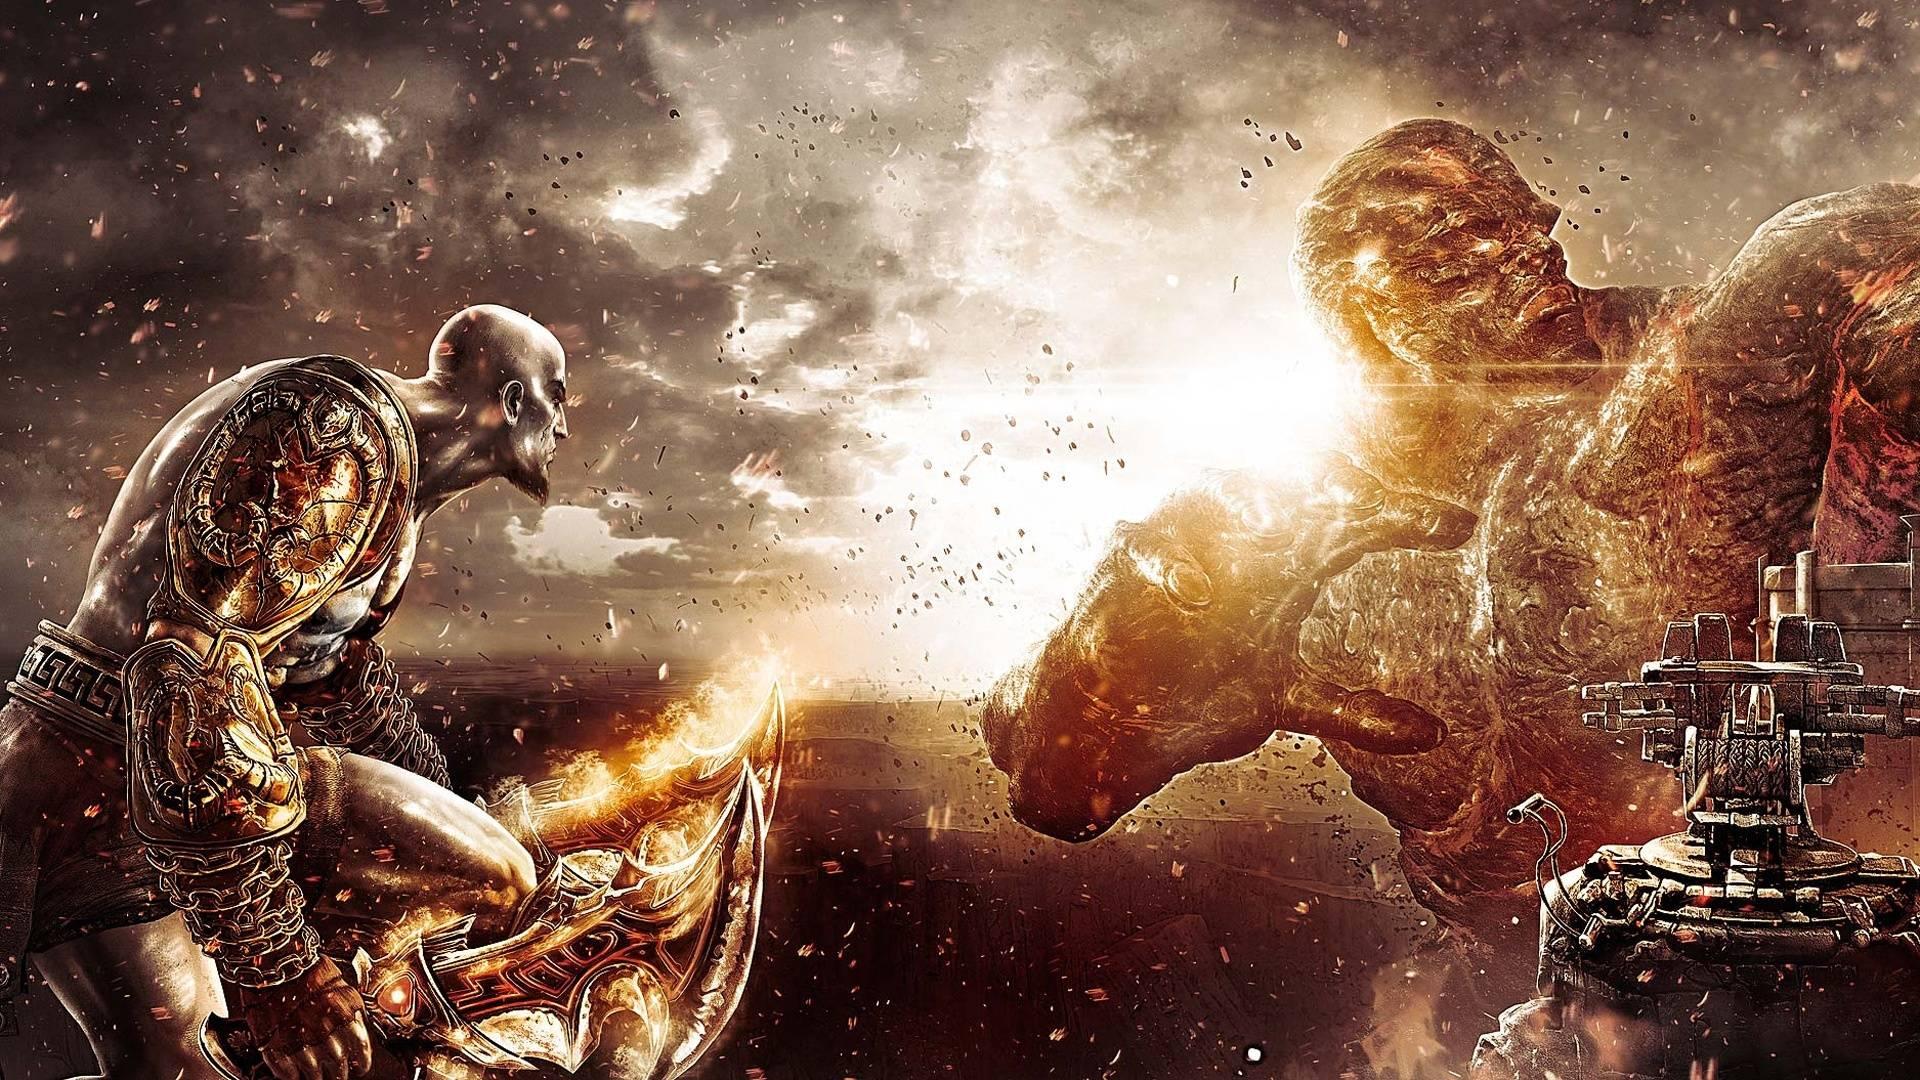 Wallpaper God Pictures God Of War 3 Wallpaper 1080p